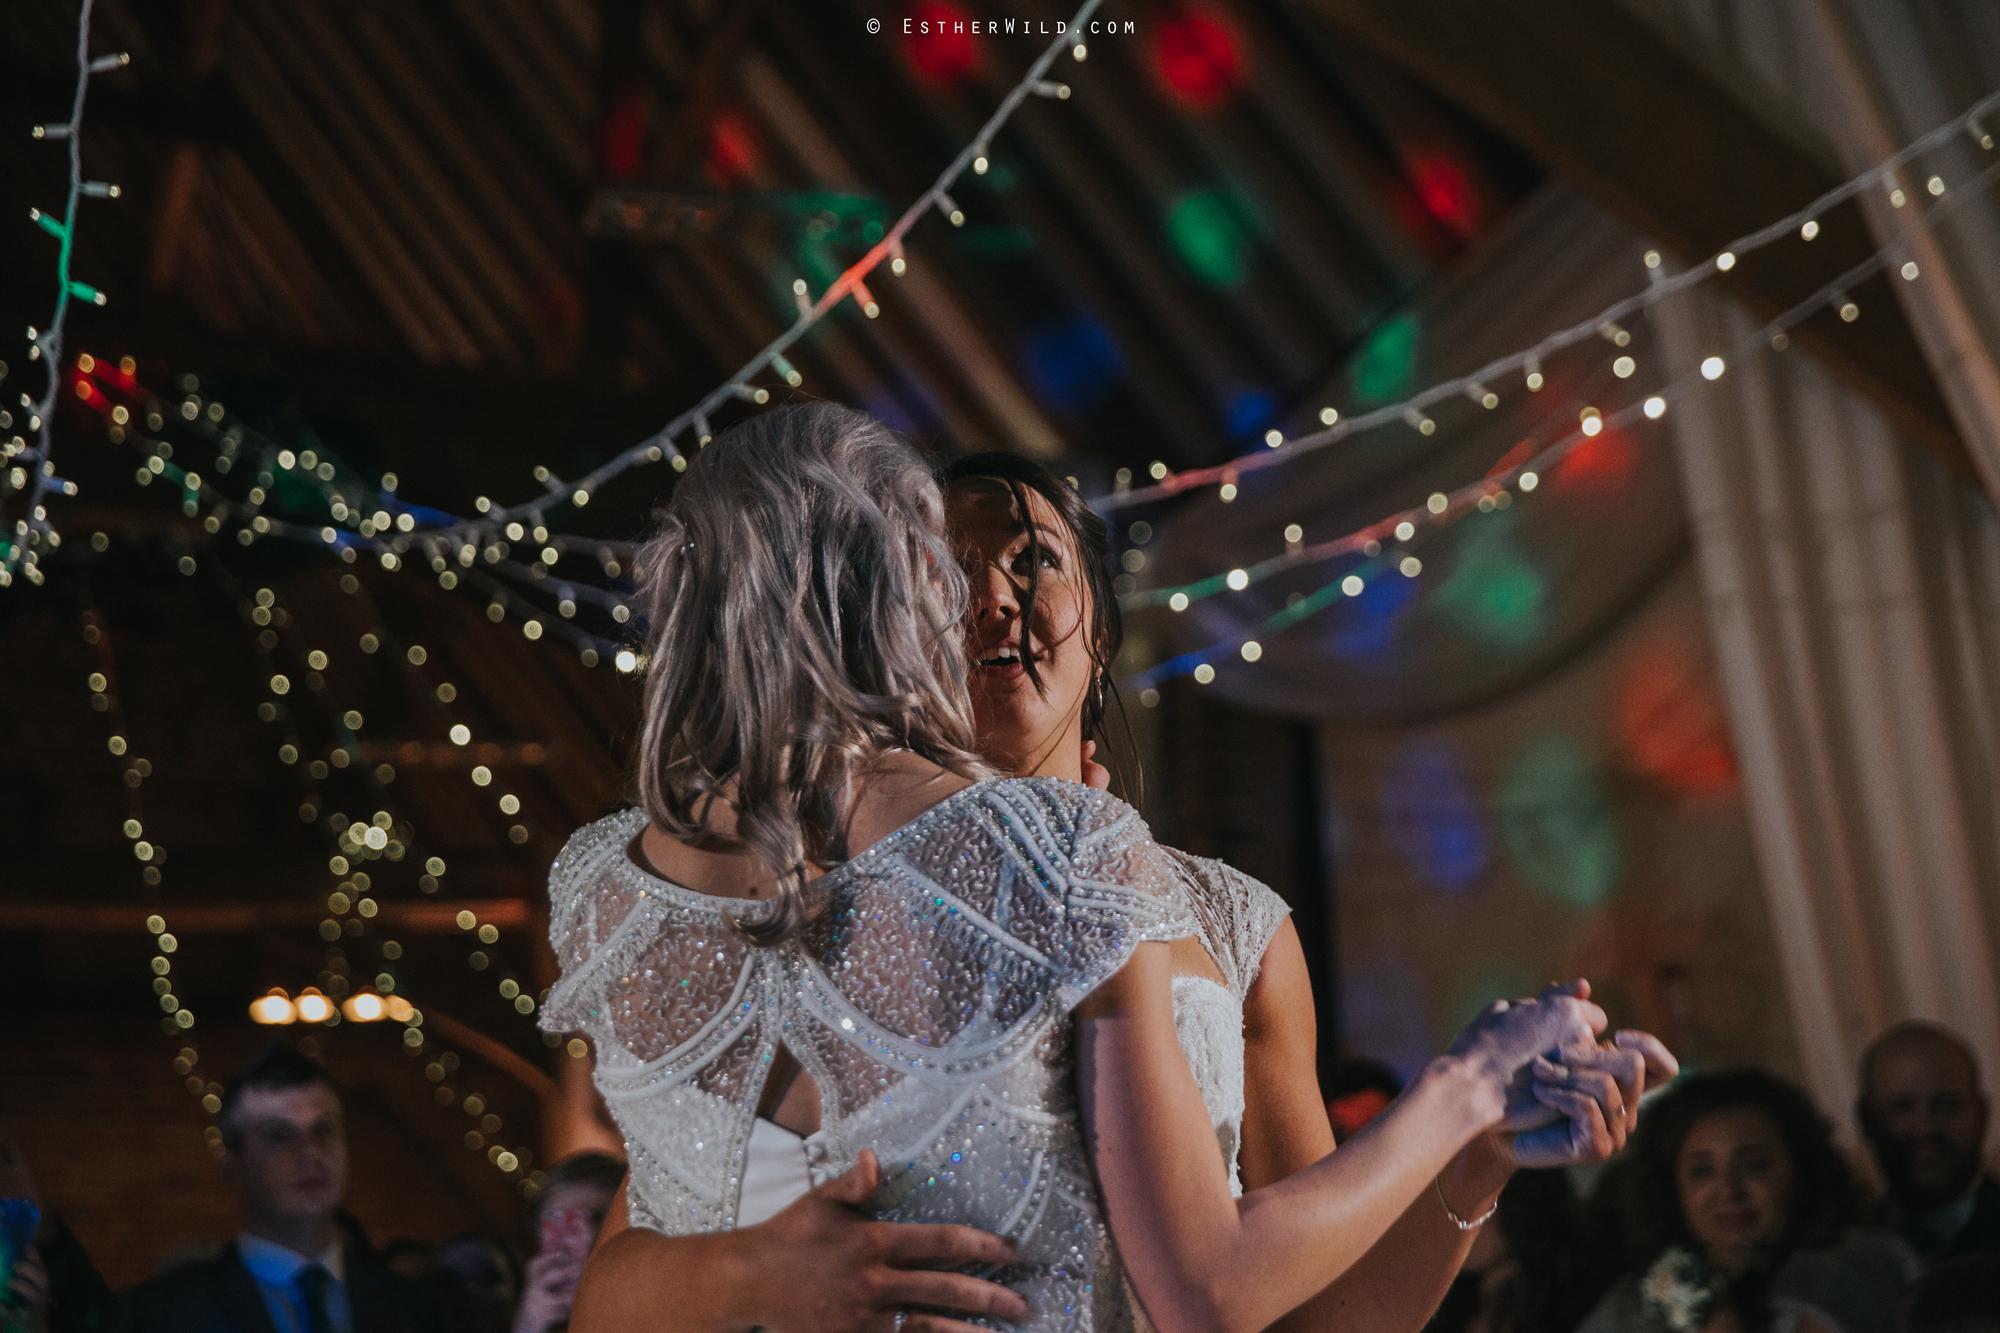 Elms_Barn_Weddings_Suffolk_Photographer_Copyright_Esther_Wild_IMG_3389.jpg